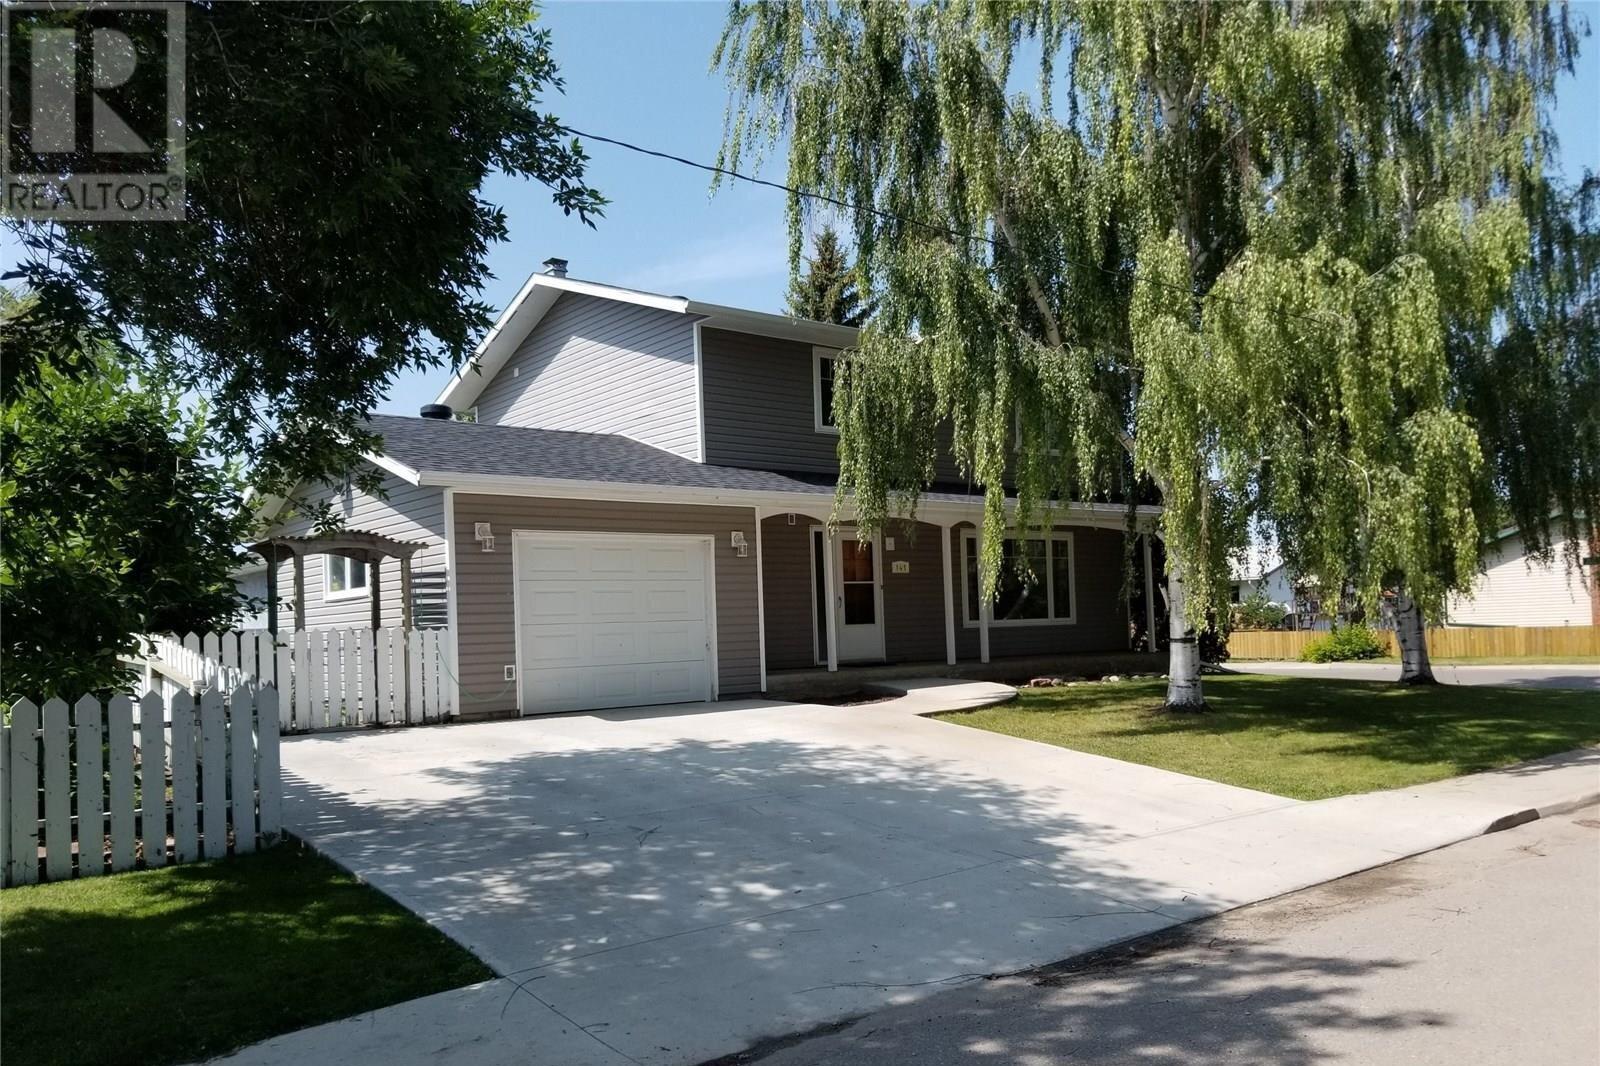 House for sale at 141 Jubilee By Unity Saskatchewan - MLS: SK817582